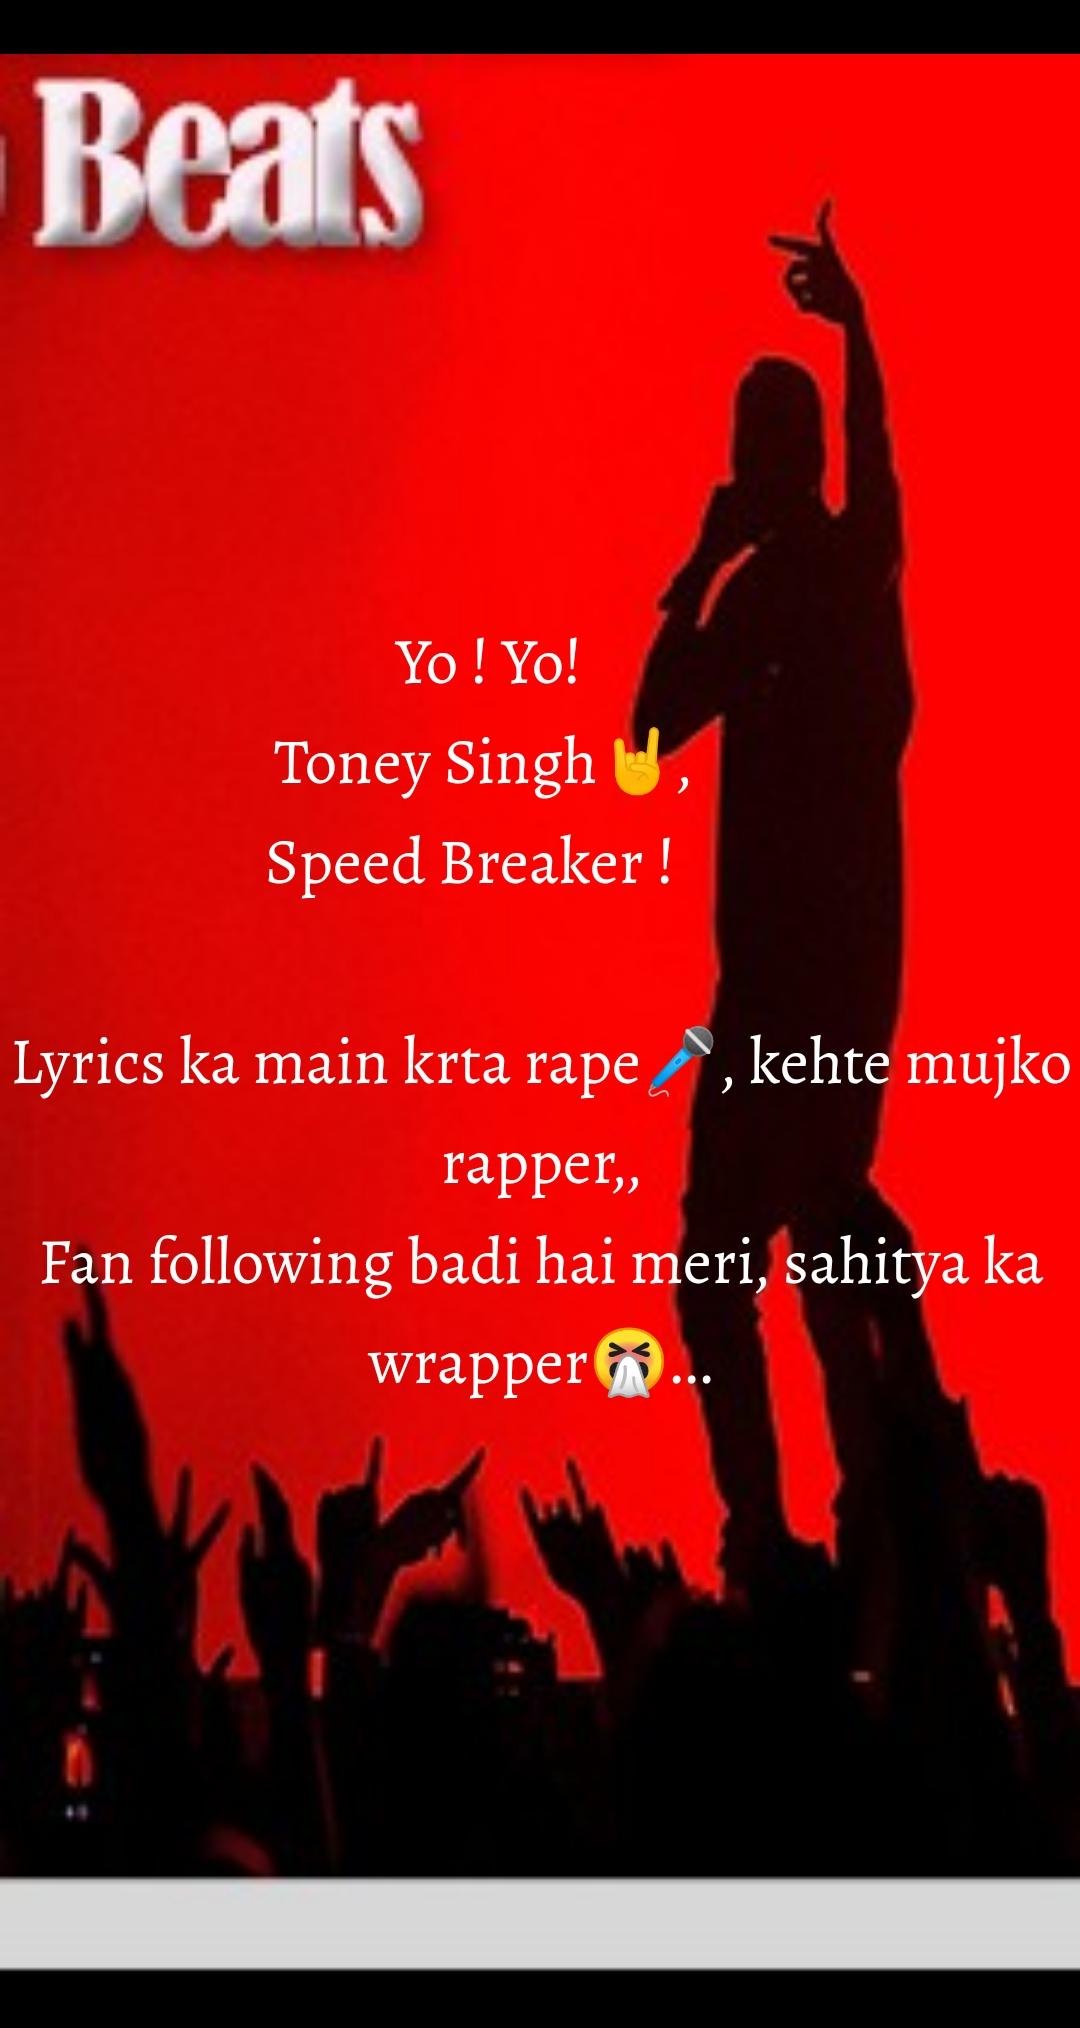 Yo ! Yo!         Toney Singh🤘,          Speed Breaker !             Lyrics ka main krta rape🎤, kehte mujko rapper,, Fan following badi hai meri, sahitya ka wrapper🤧...